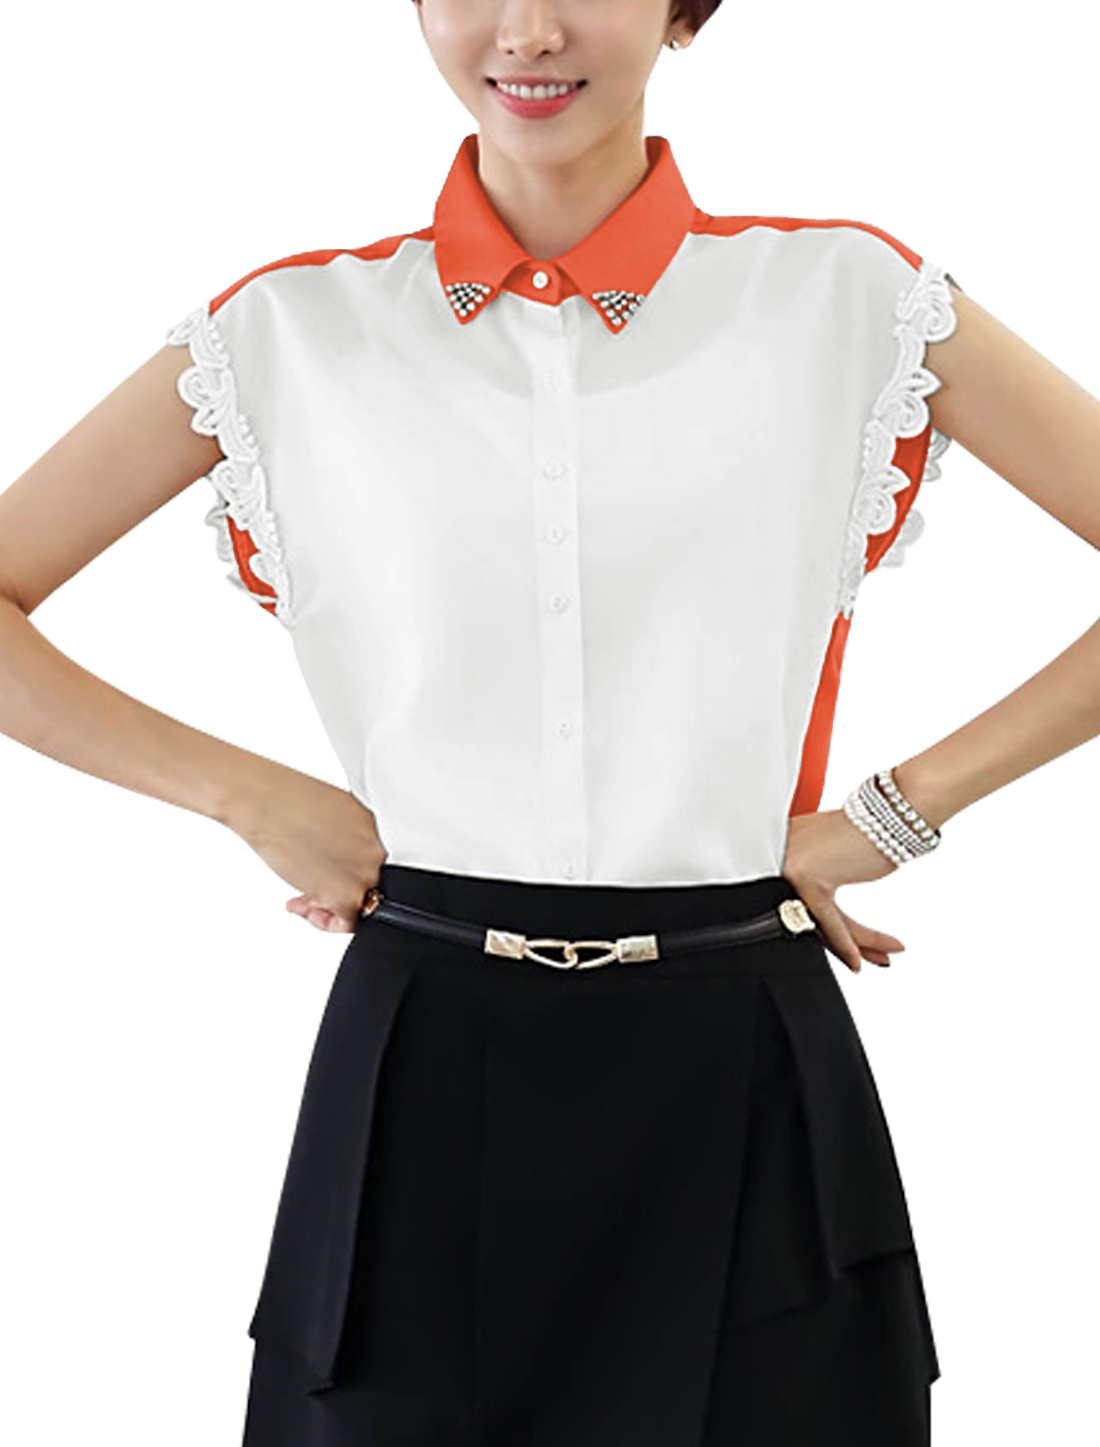 Women Single Breasted Bead Adorn Elegant Chiffon Top Shirt Orange White S